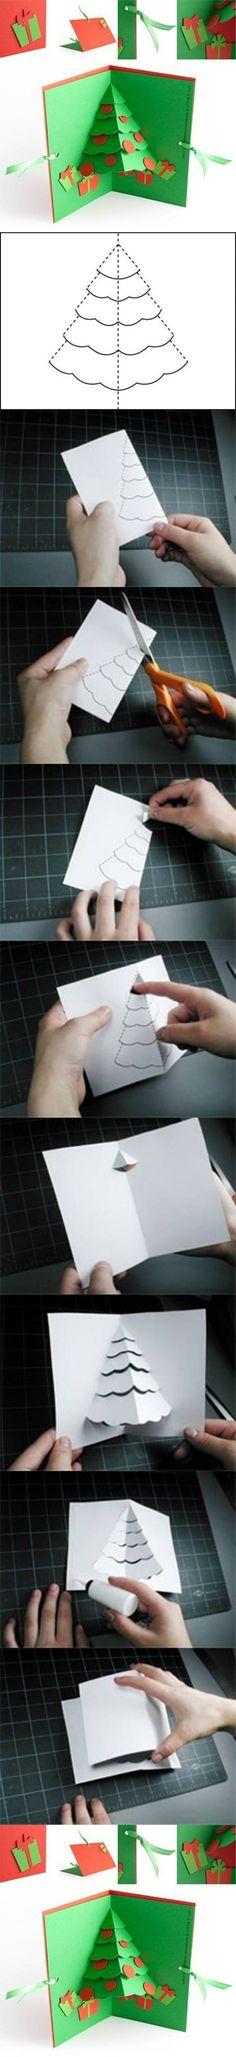 How to make Christmas Tree Pop Up Card s……_来自crazy胖胖星的图片分享-堆糖